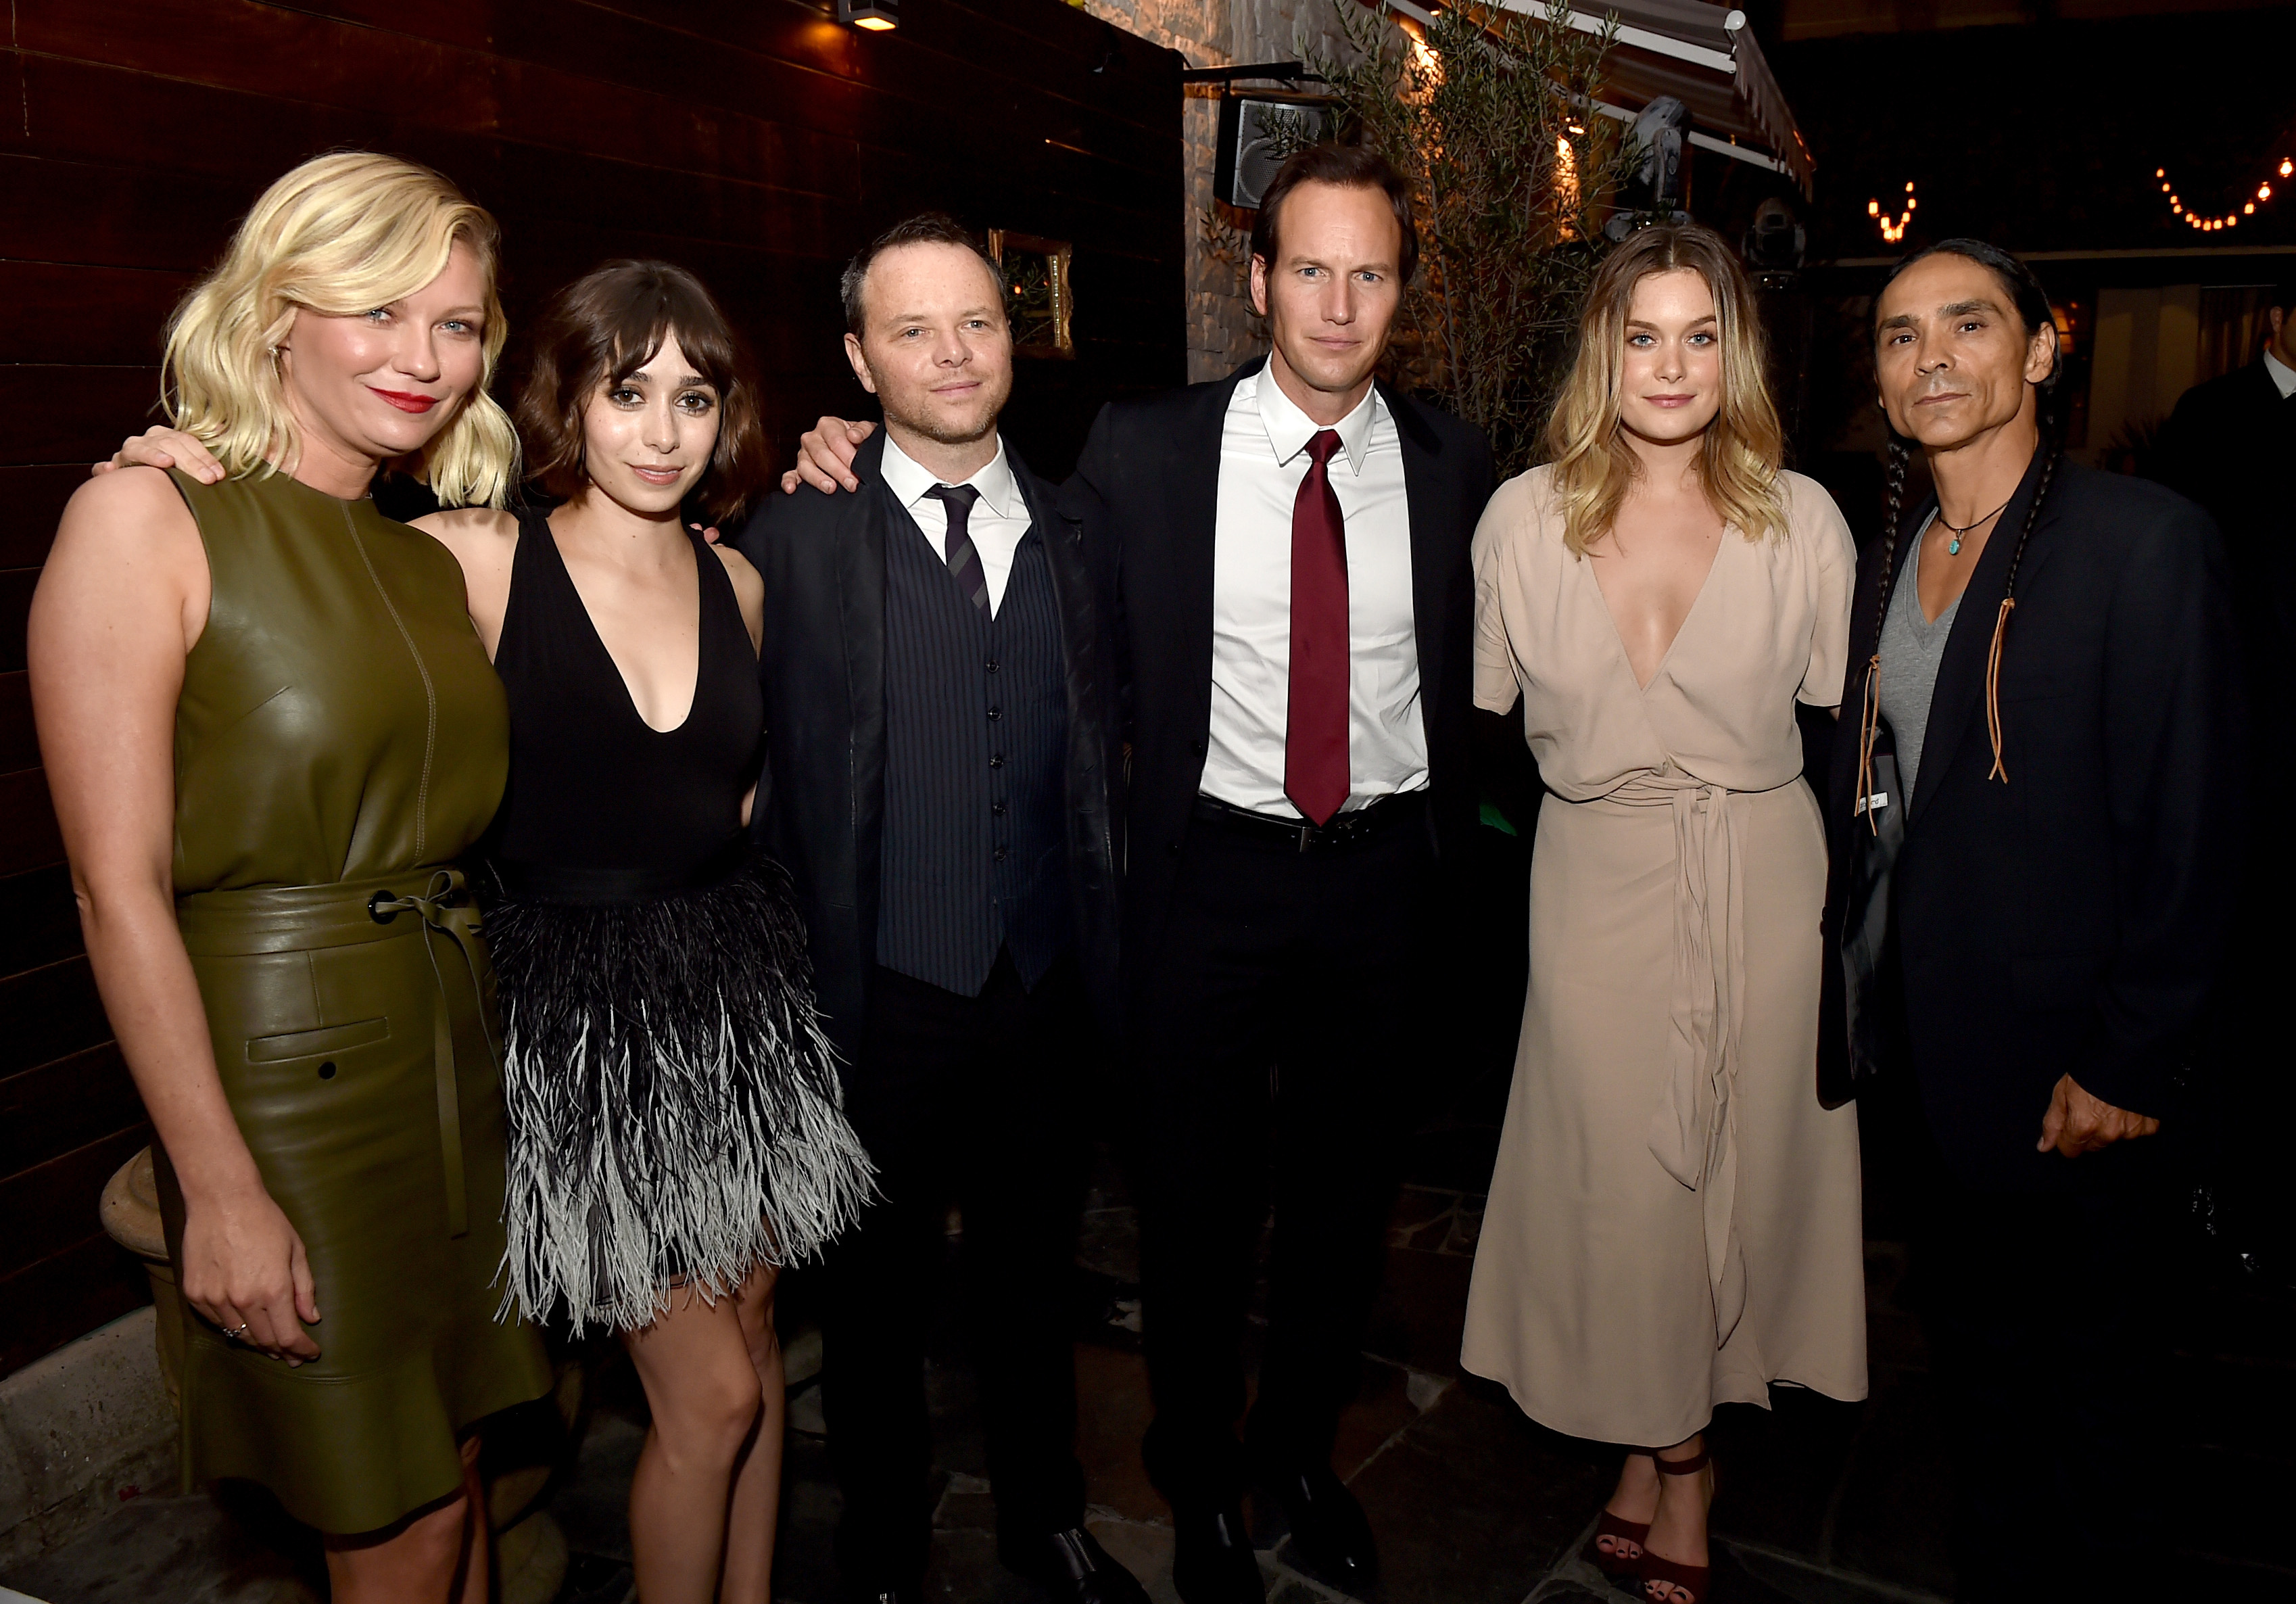 The 'Fargo' Season 2 Cast Is Even Better Than Season 1